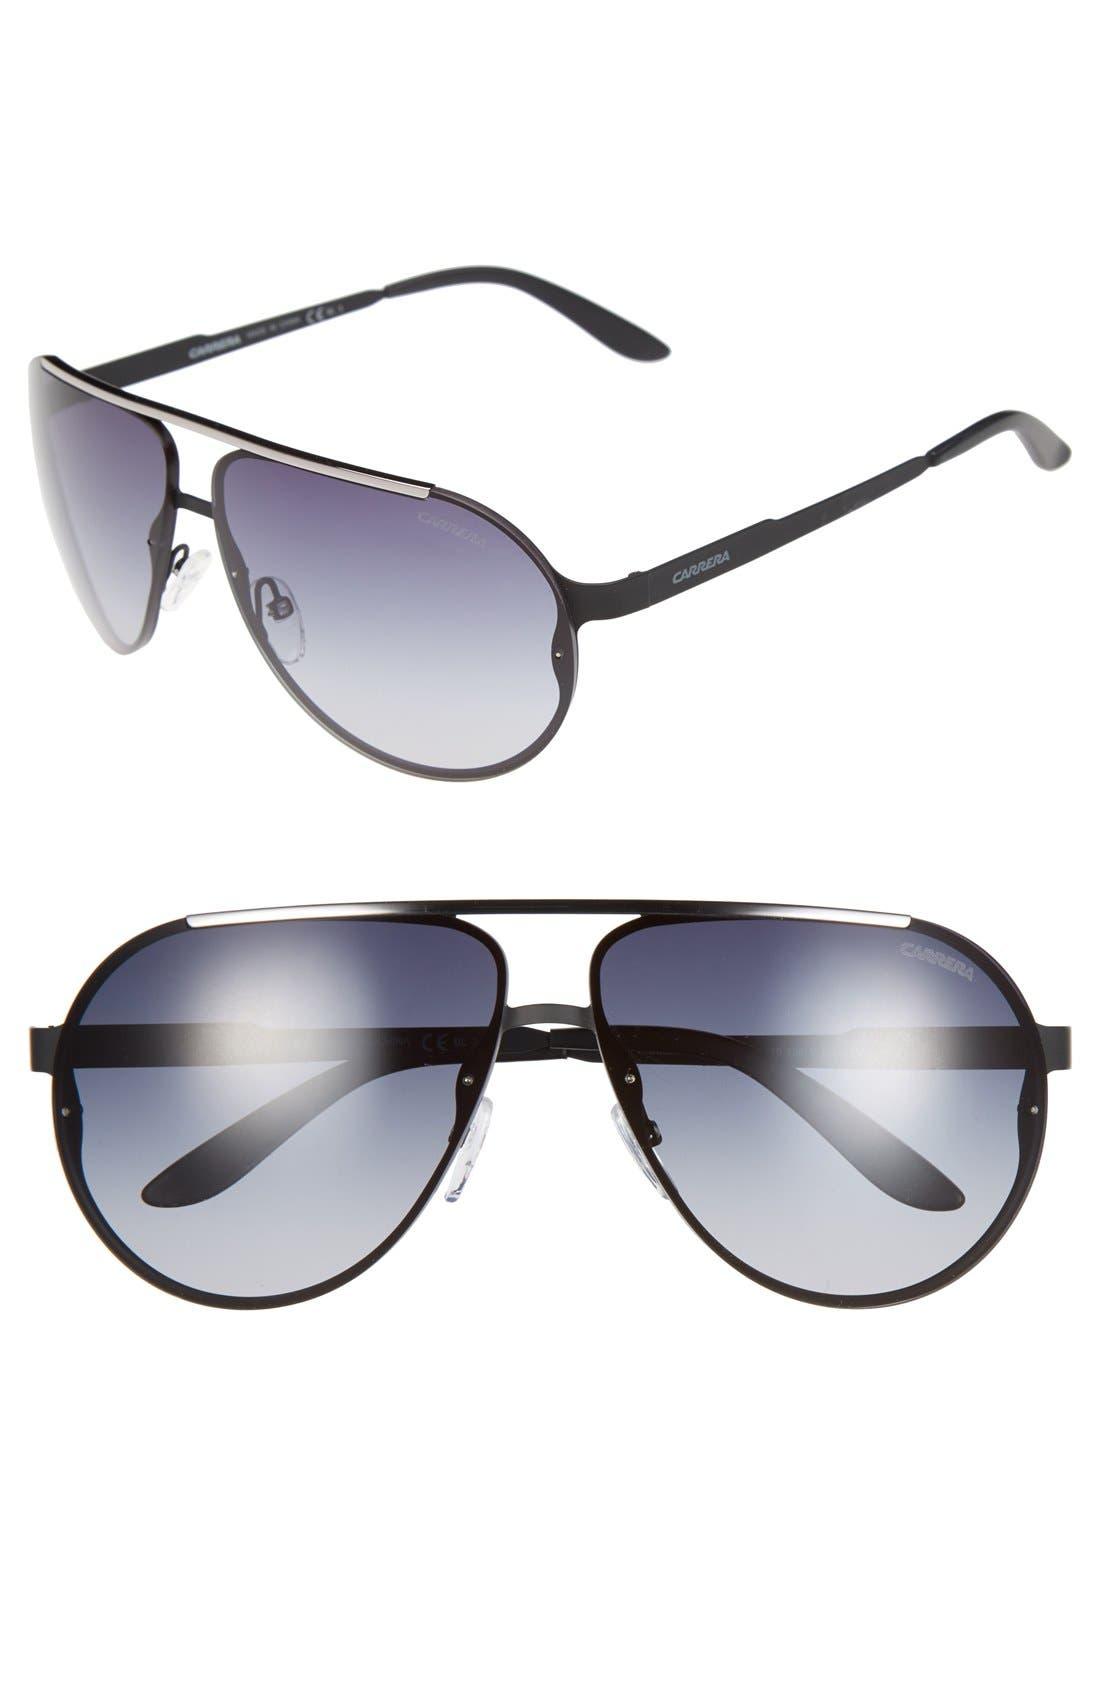 65mm Aviator Sunglasses,                             Main thumbnail 2, color,